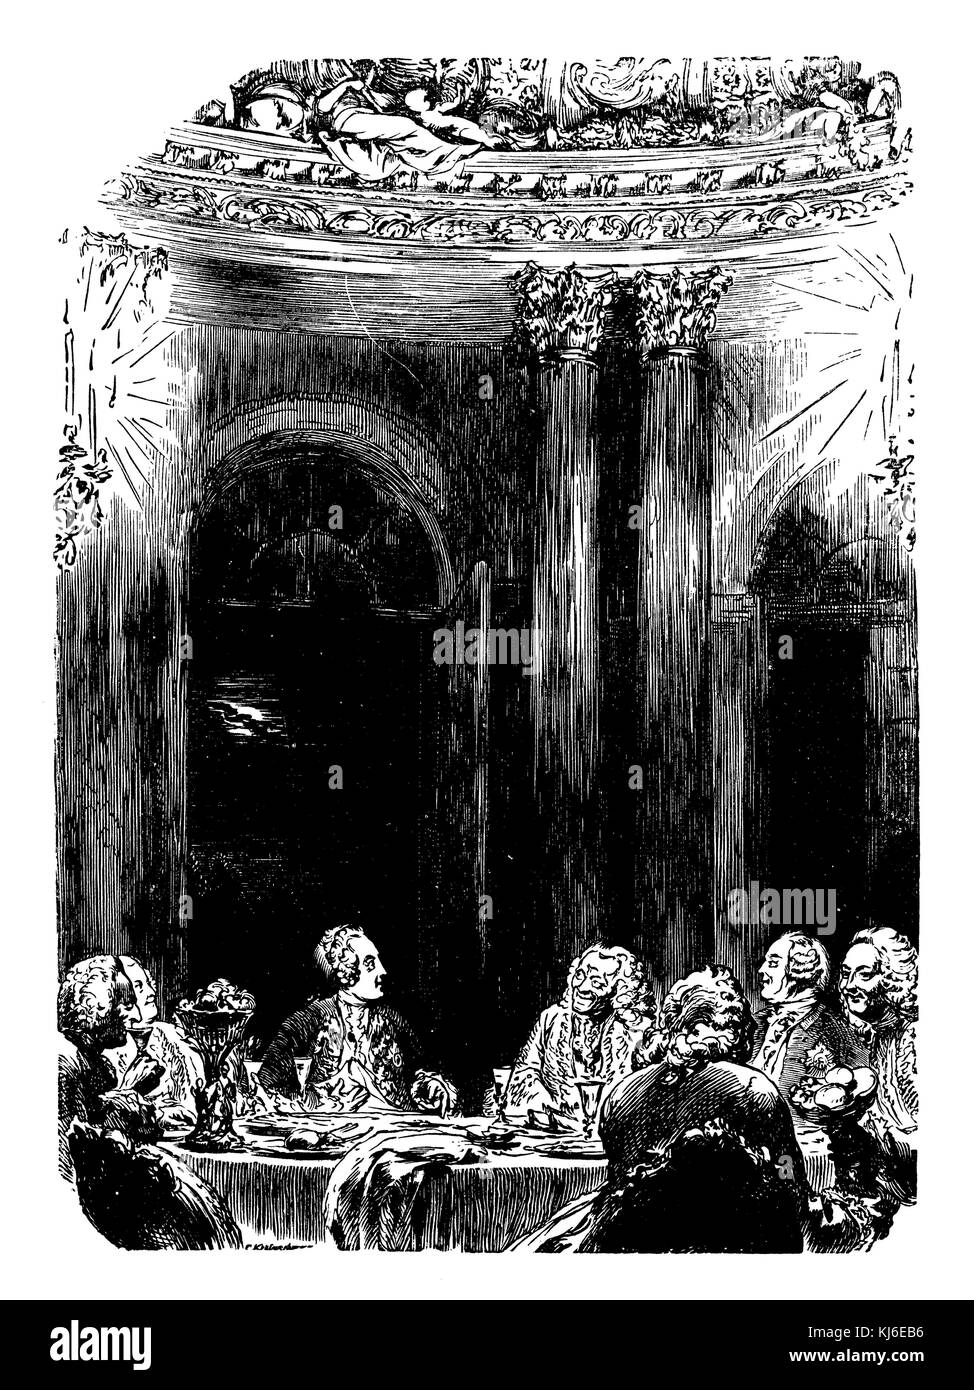 Supper at Schloss Sanssouci, Voltaire and Frederick the Great (Abendtafel im Schloss Sanssouci, Voltaire und Friedrich - Stock Image